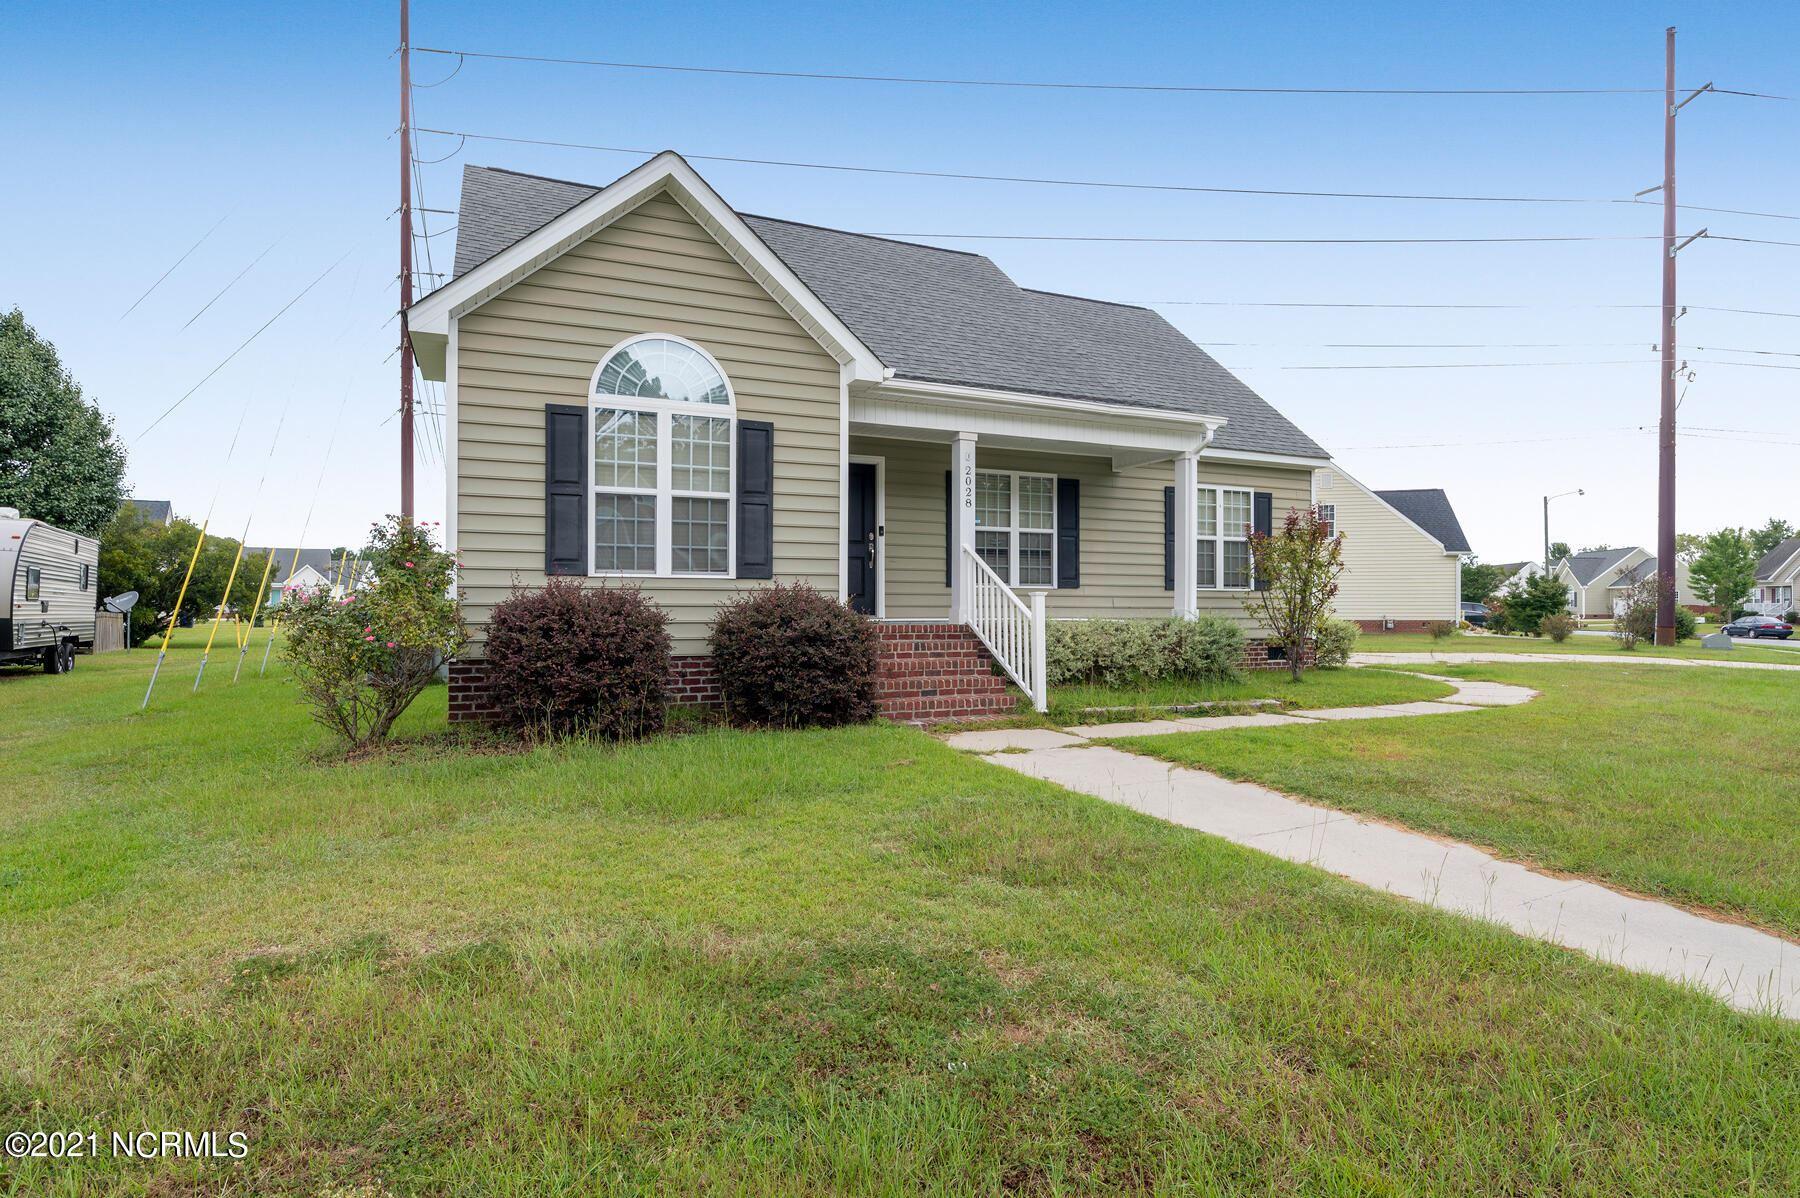 Photo of 2028 Cherrytree Lane, Winterville, NC 28590 (MLS # 100289465)